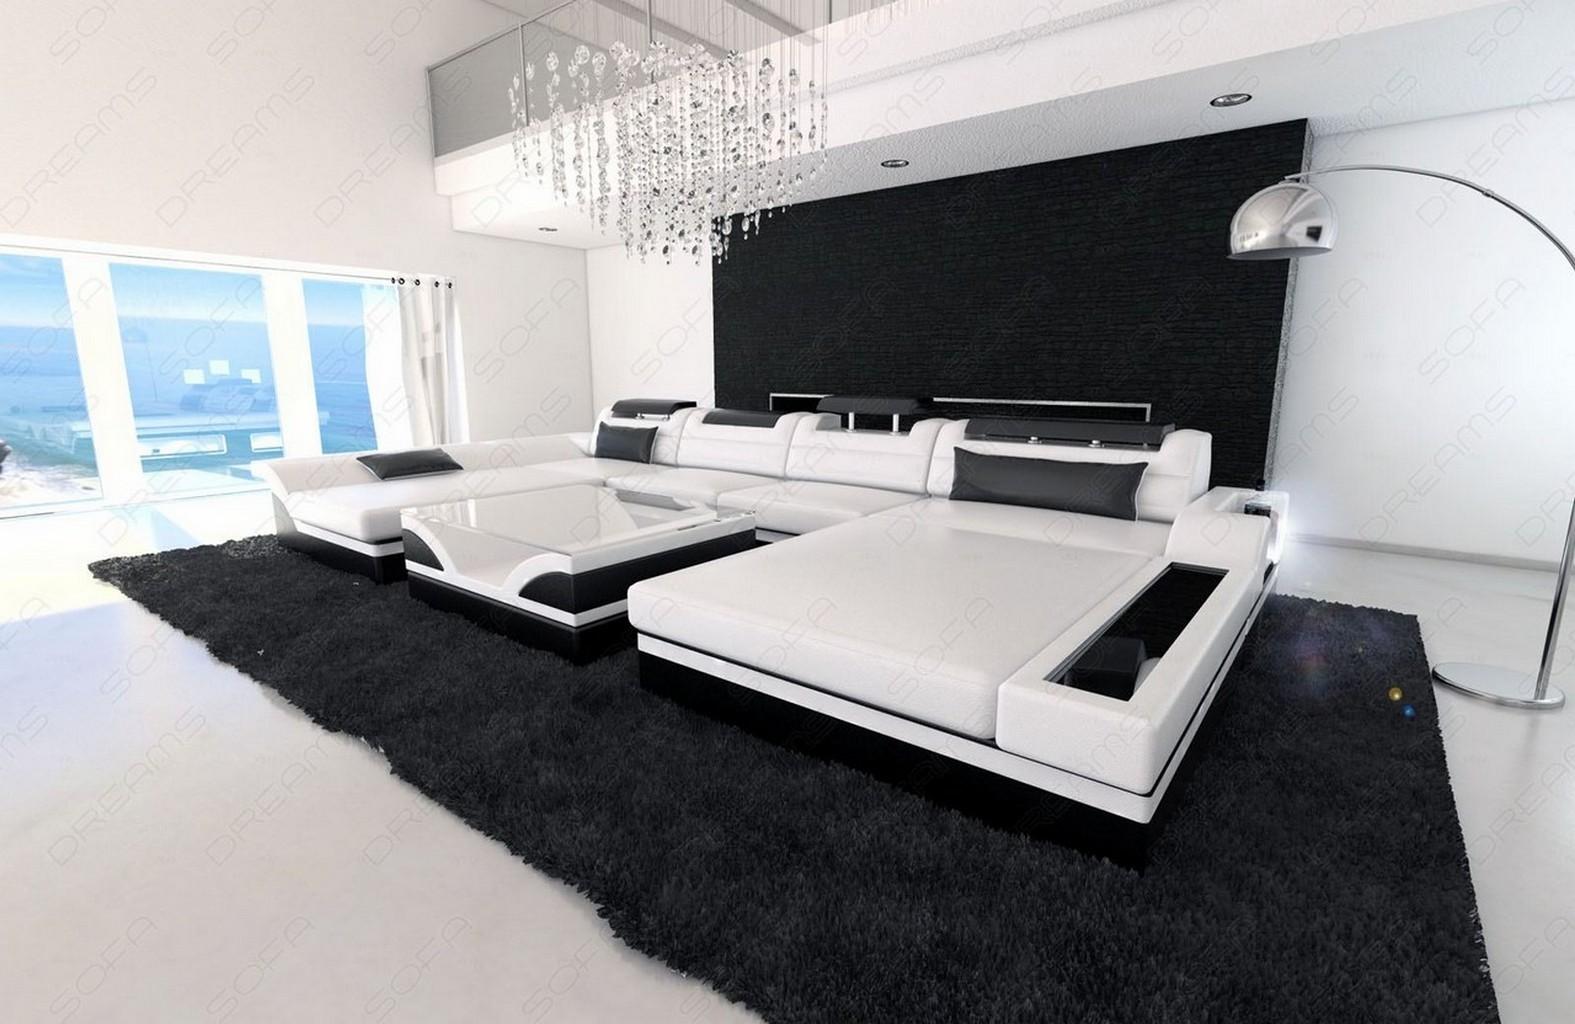 Big Sectional Sofa MONZA U-Shaped with LED Lights white black  eBay